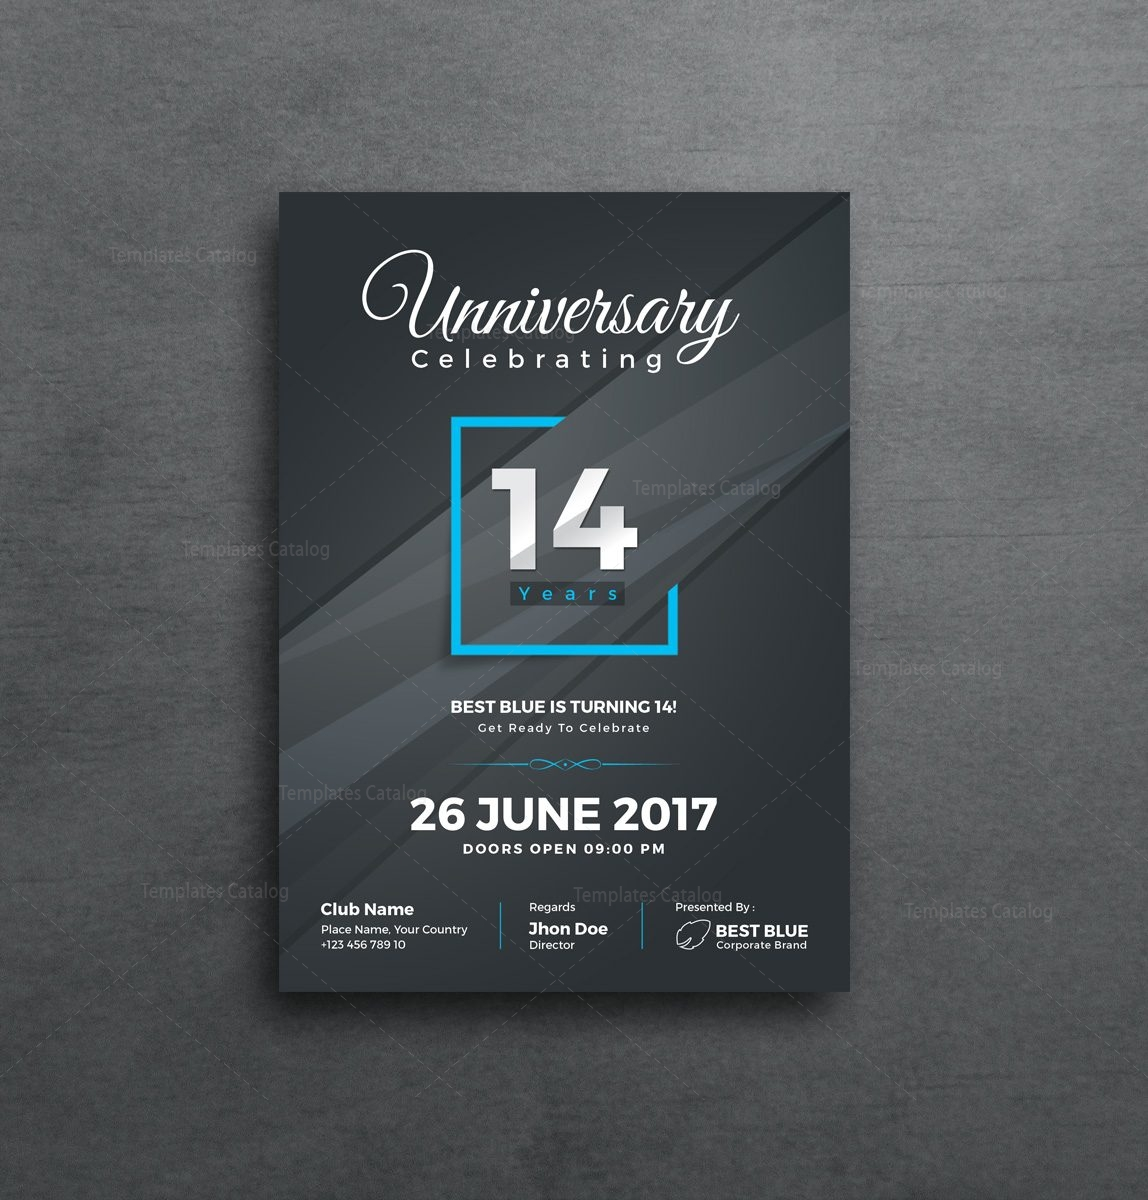 Artemis Stylish Anniversary Invitation Template 001129 Template Catalog